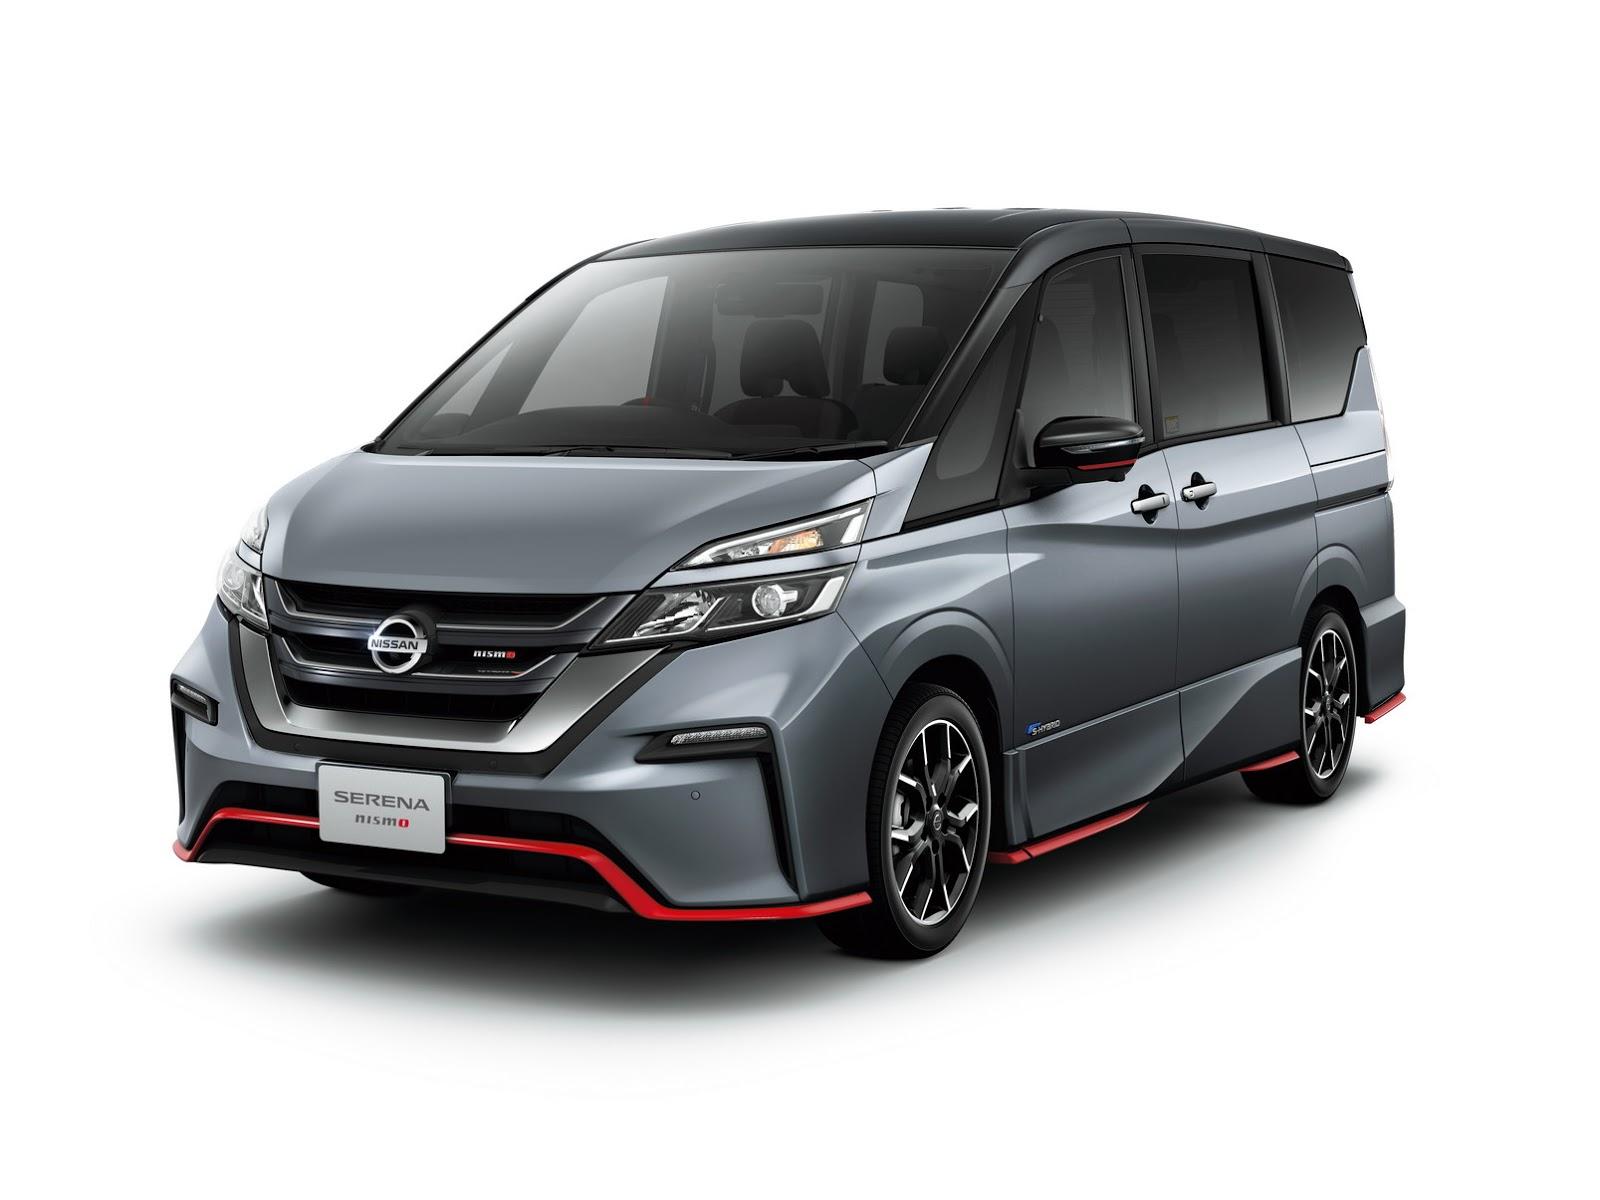 Nissan_Serena_Nismo_17